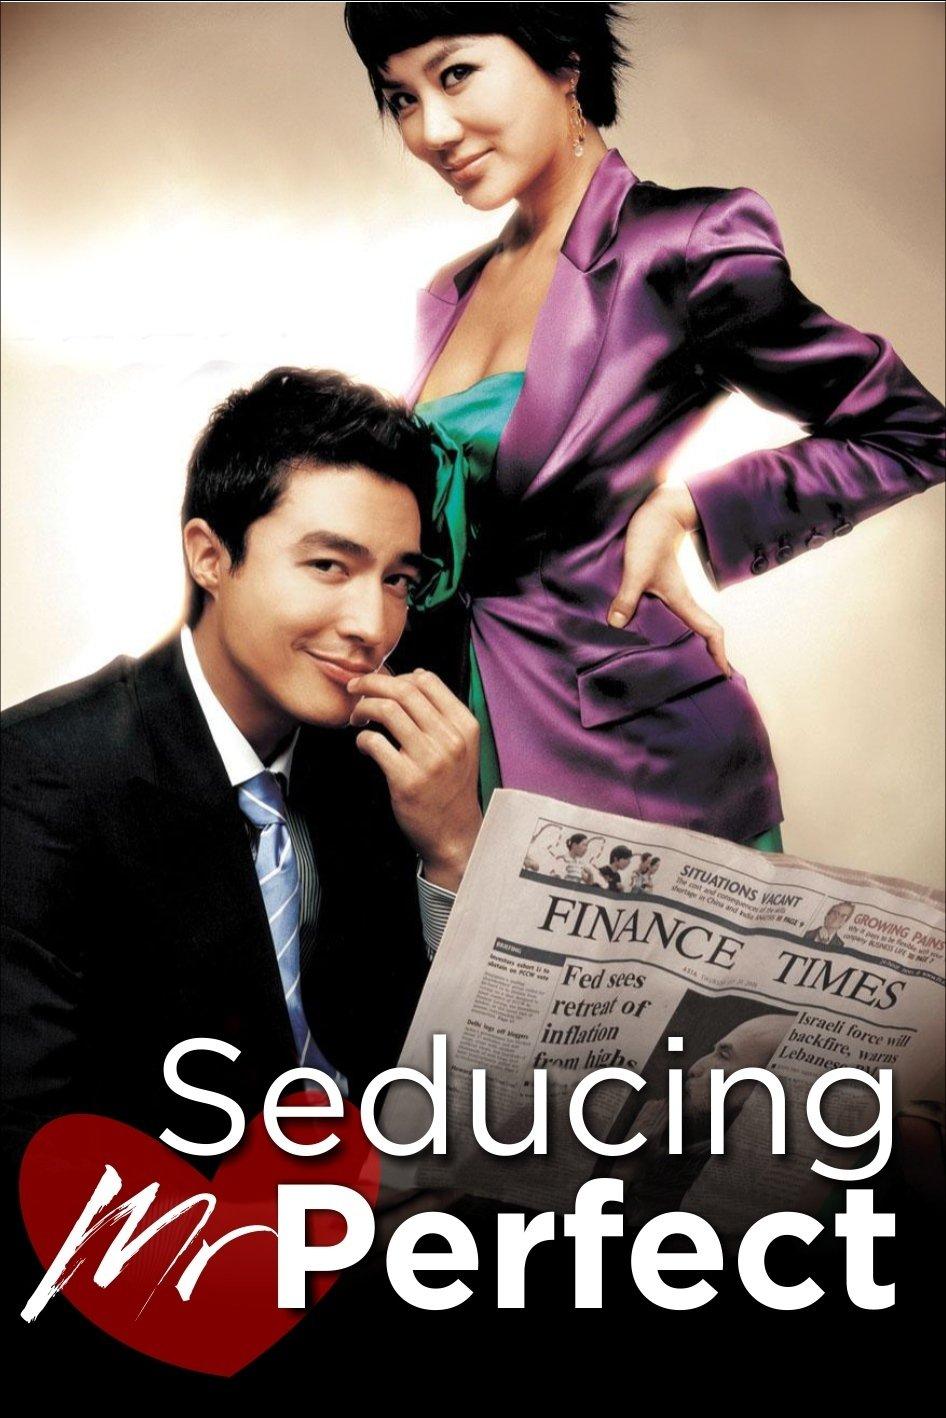 affiche du film Seducing Mr. Perfect